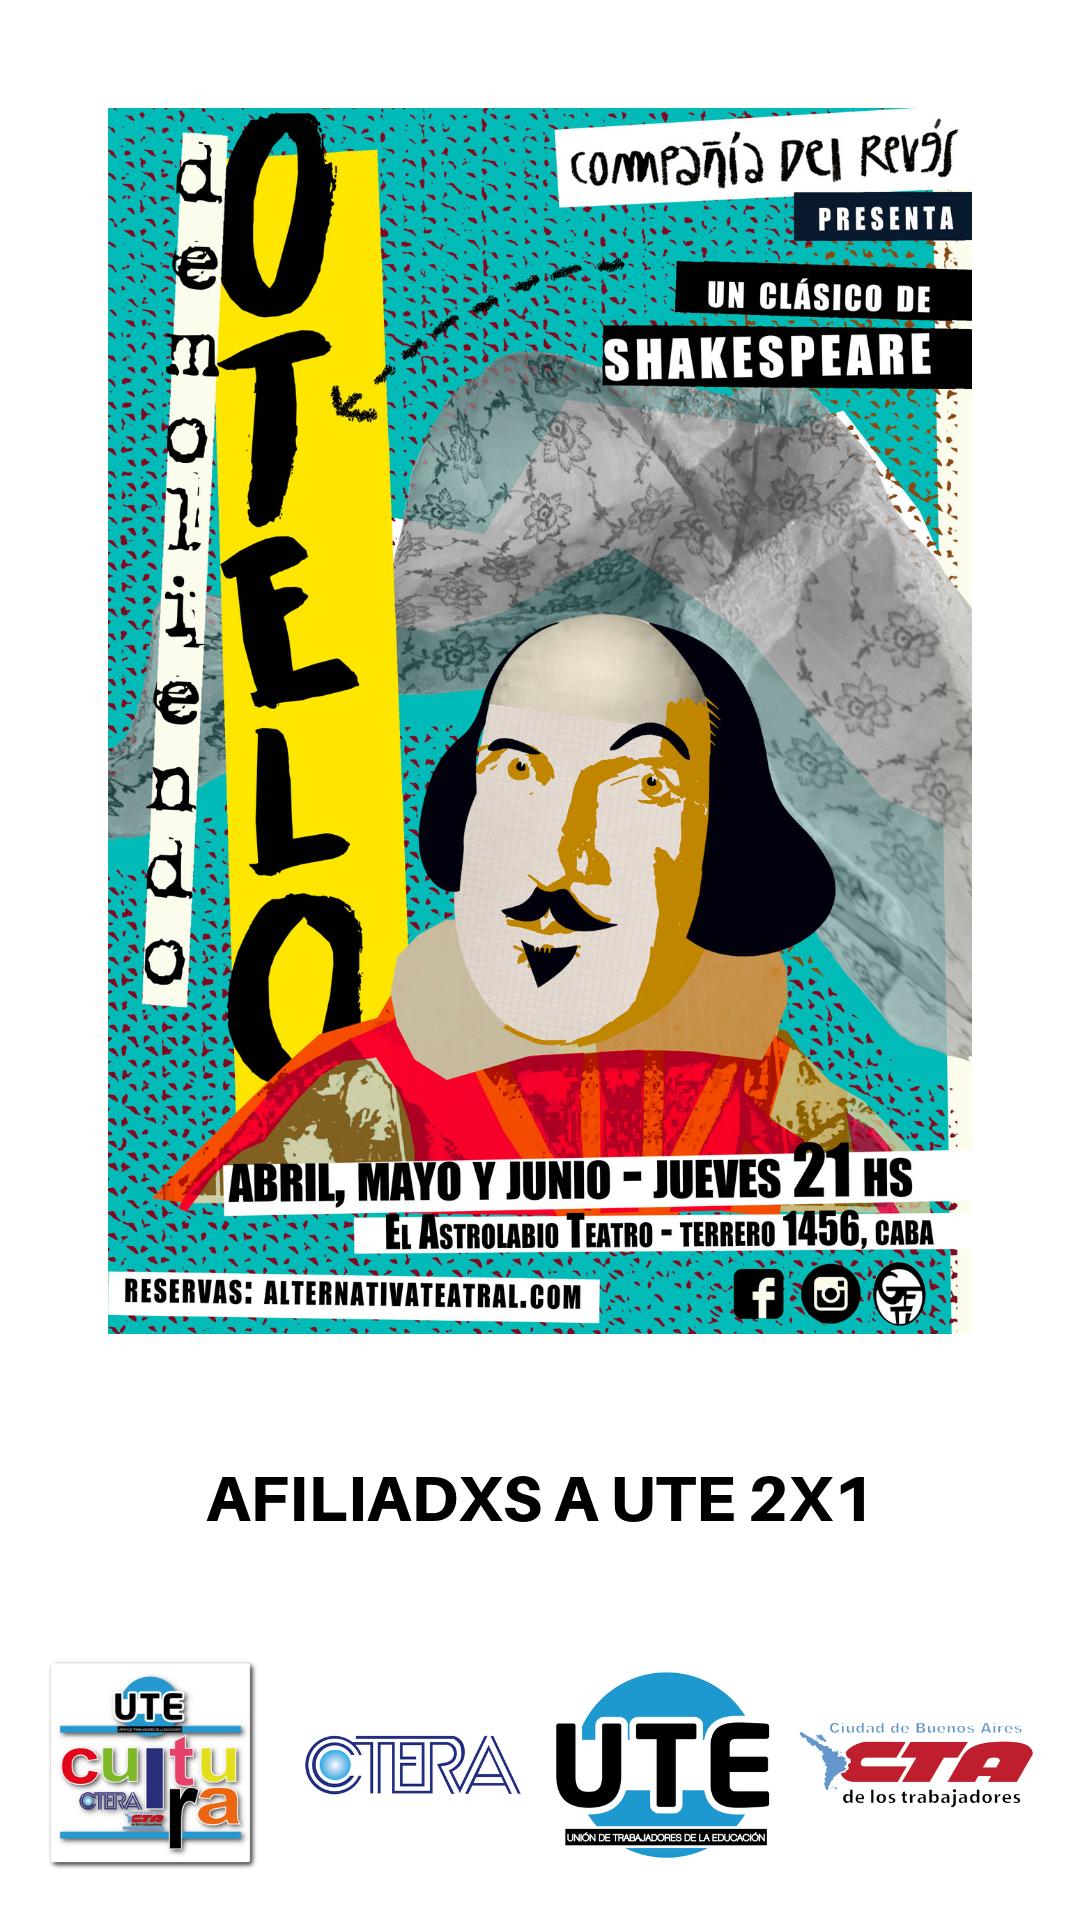 DEMOLIENDO OTELO de Compañia del Revés - 2x1 para afiliadxs a UTE